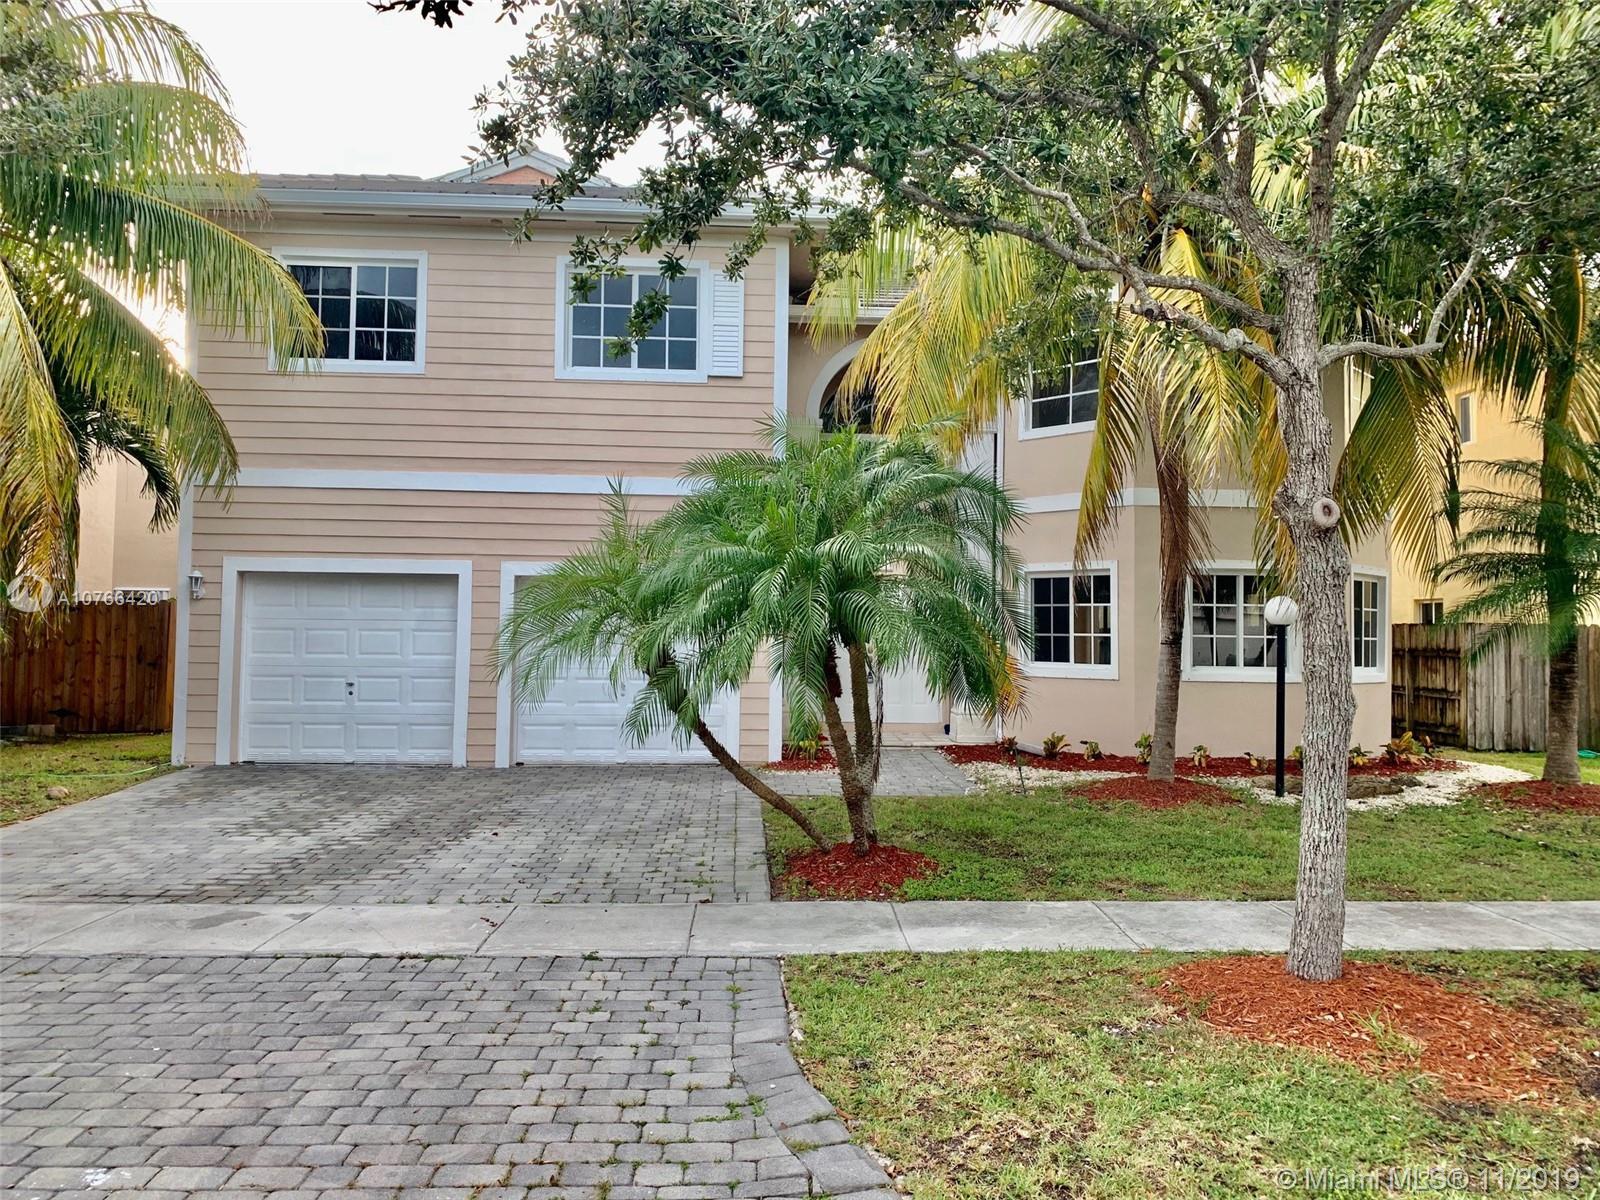 378 NE 30th Ave, Homestead, Florida